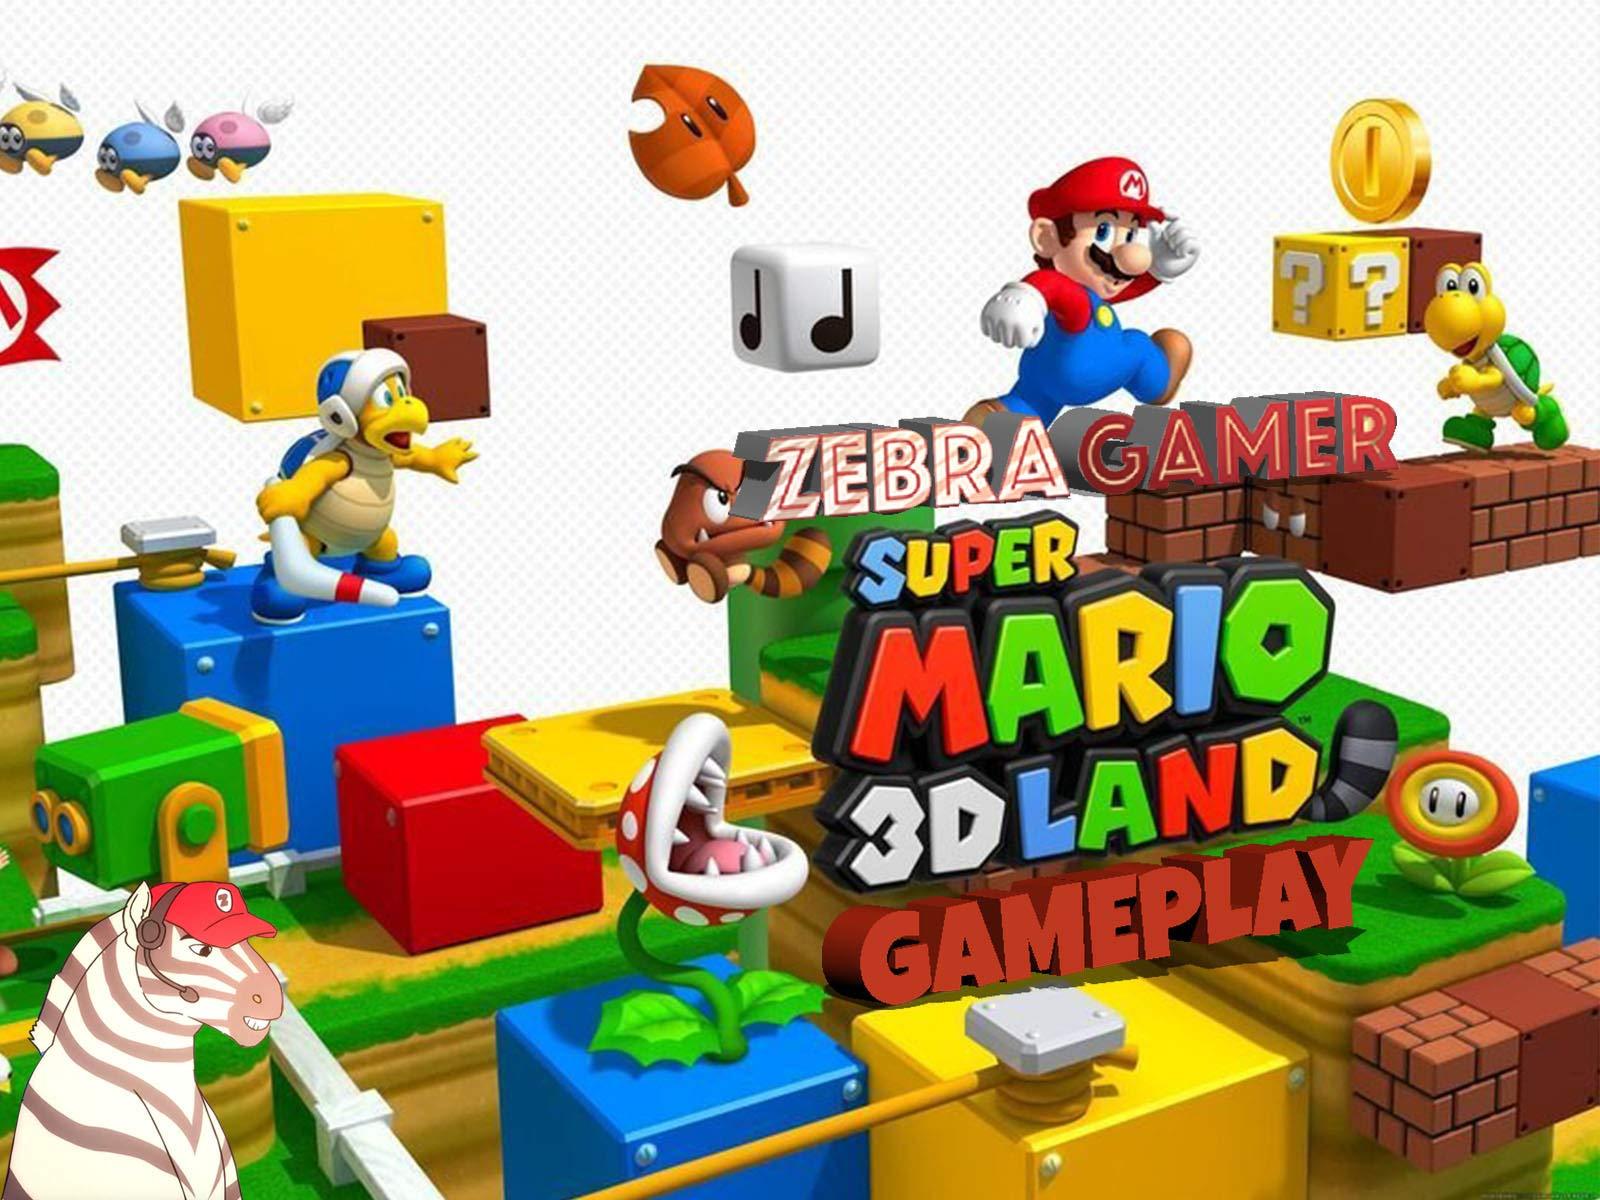 Clip: Super Mario 3D Land Gameplay - Zebra Gamer - Season 1